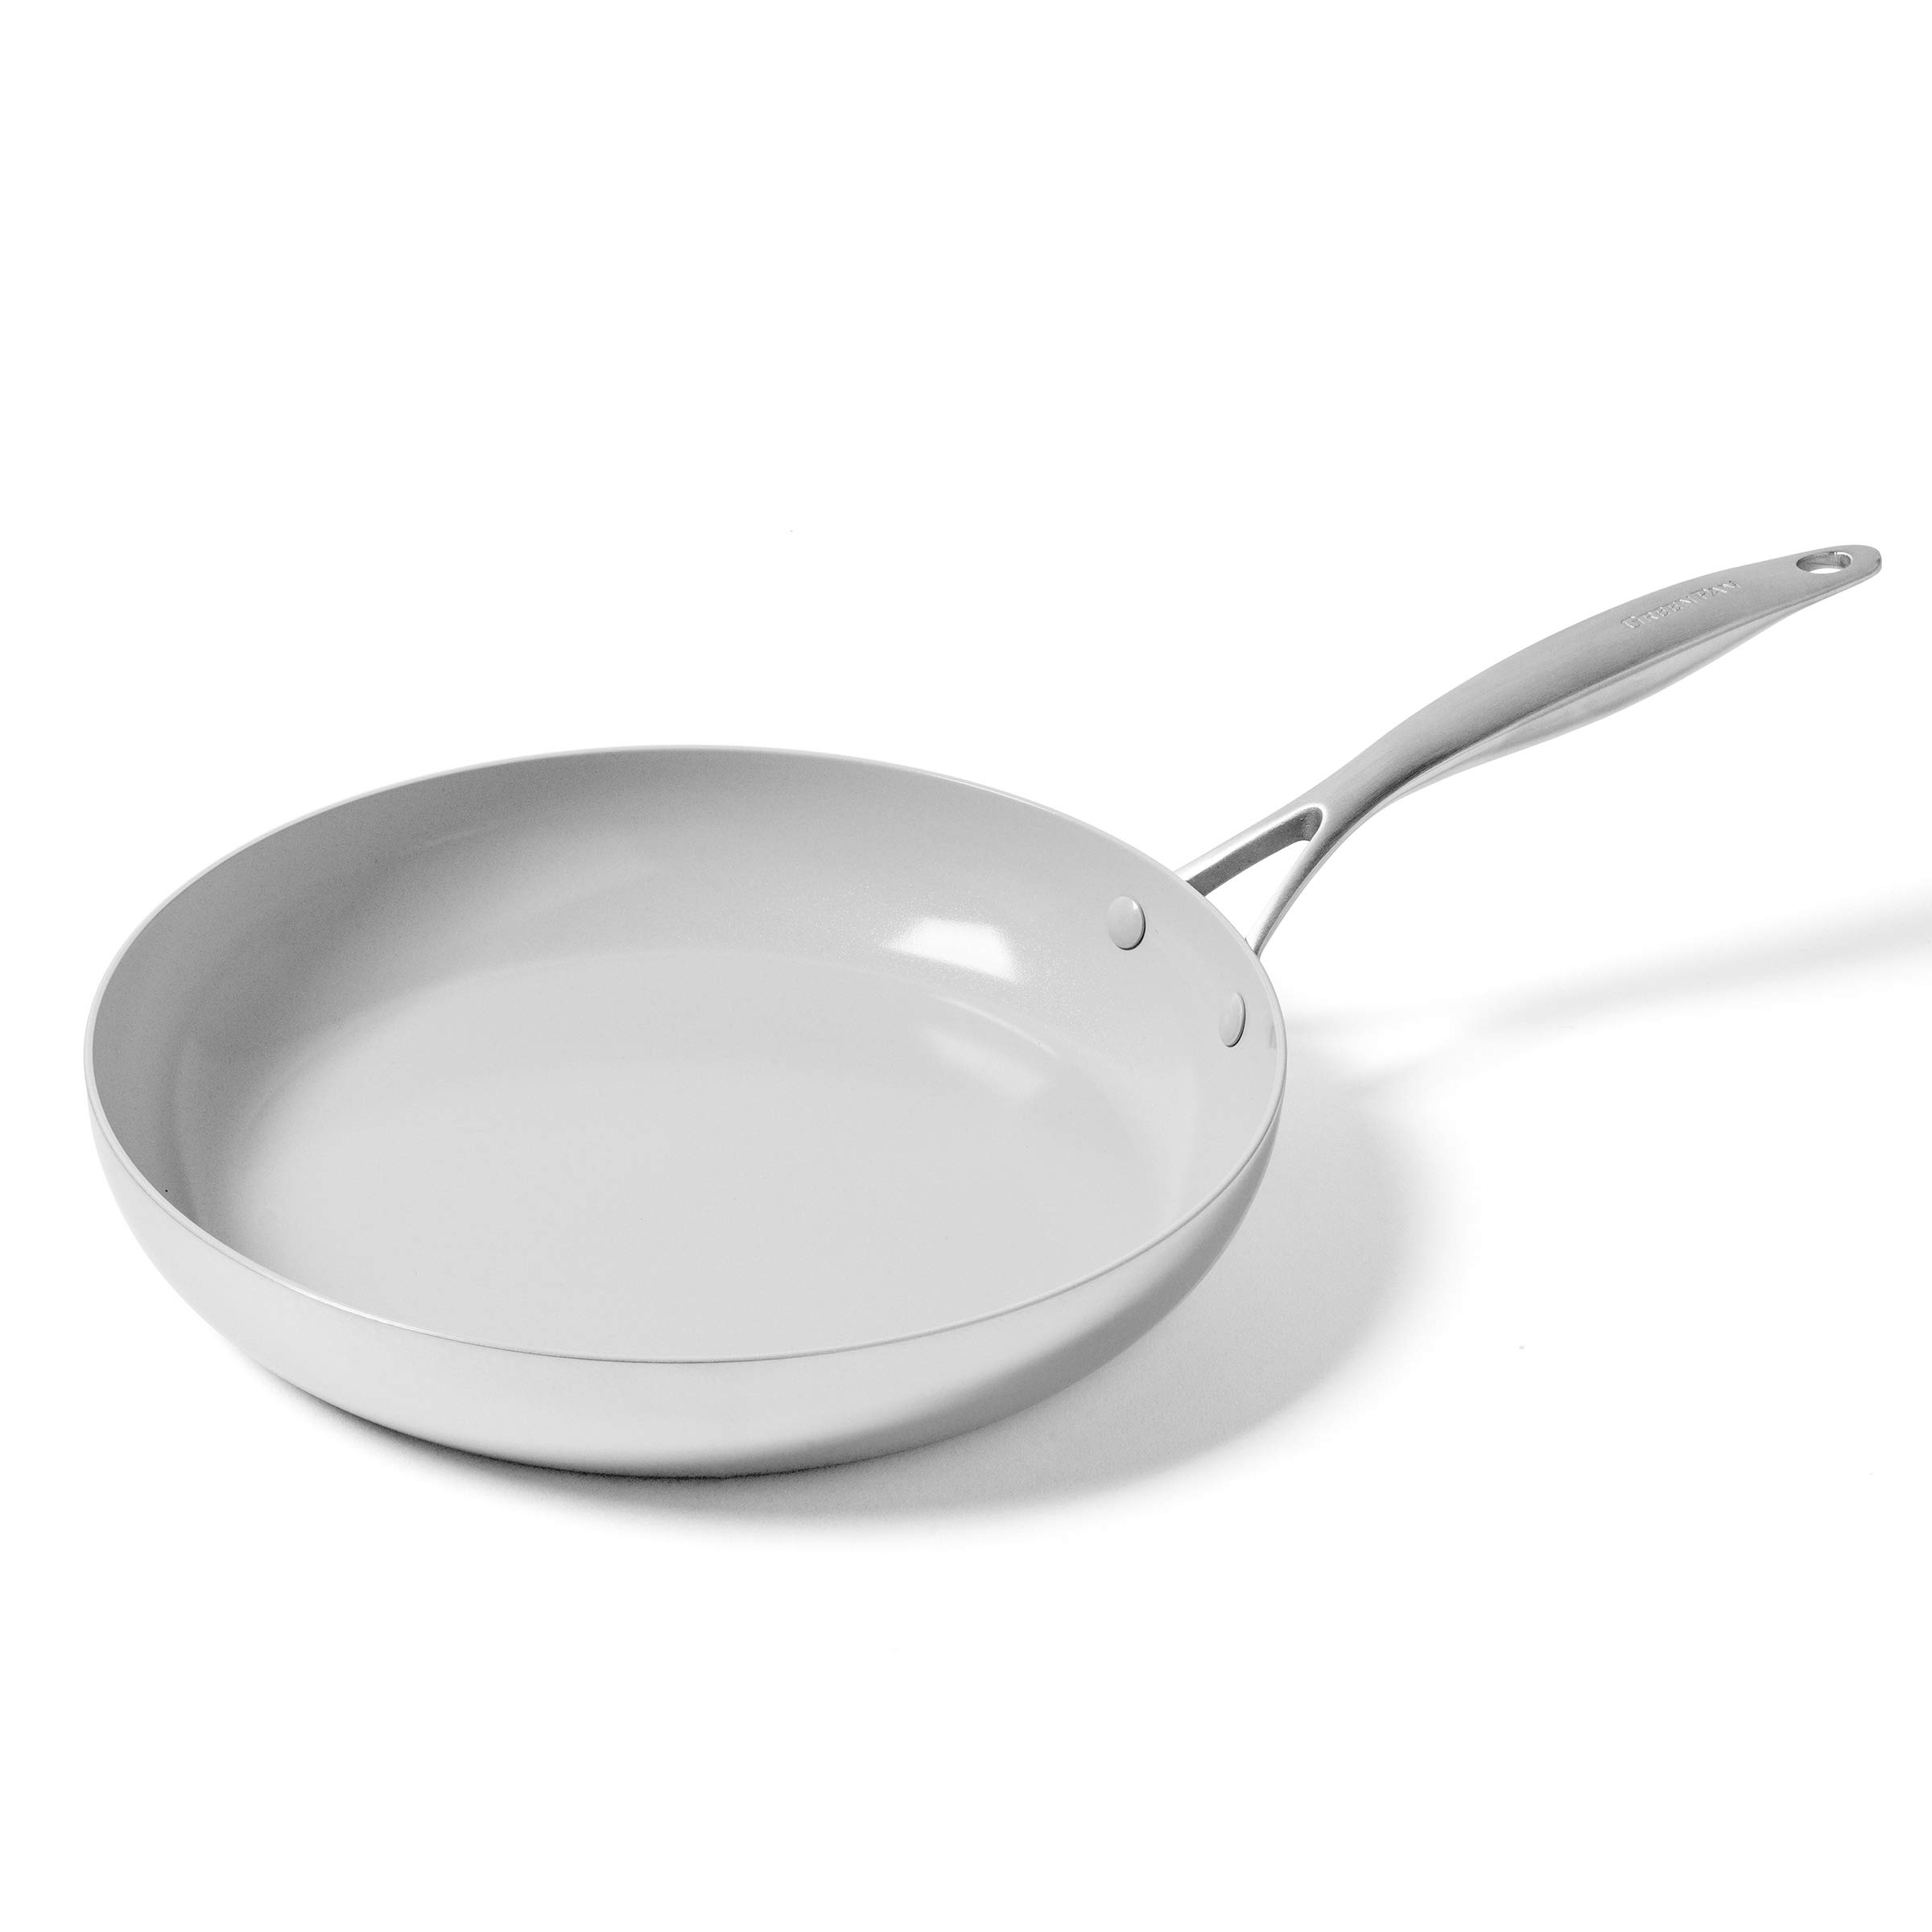 GreenPan CC002256-001 Venice Pro Ceramic Frying Pan 12'' Light Grey